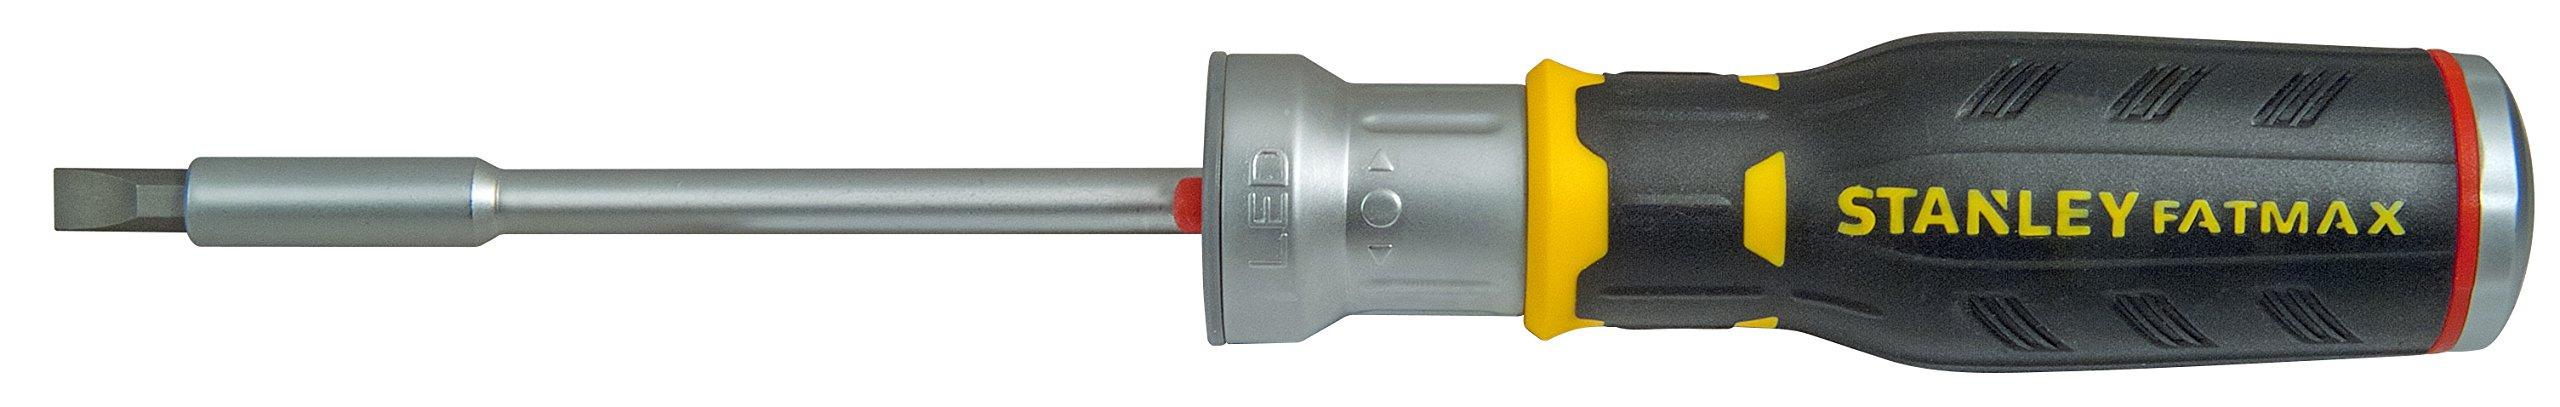 611fwQxEQpL - STANLEY FMHT0-62689 - Multipuntas FatMax de carraca con LED. 12 puntas